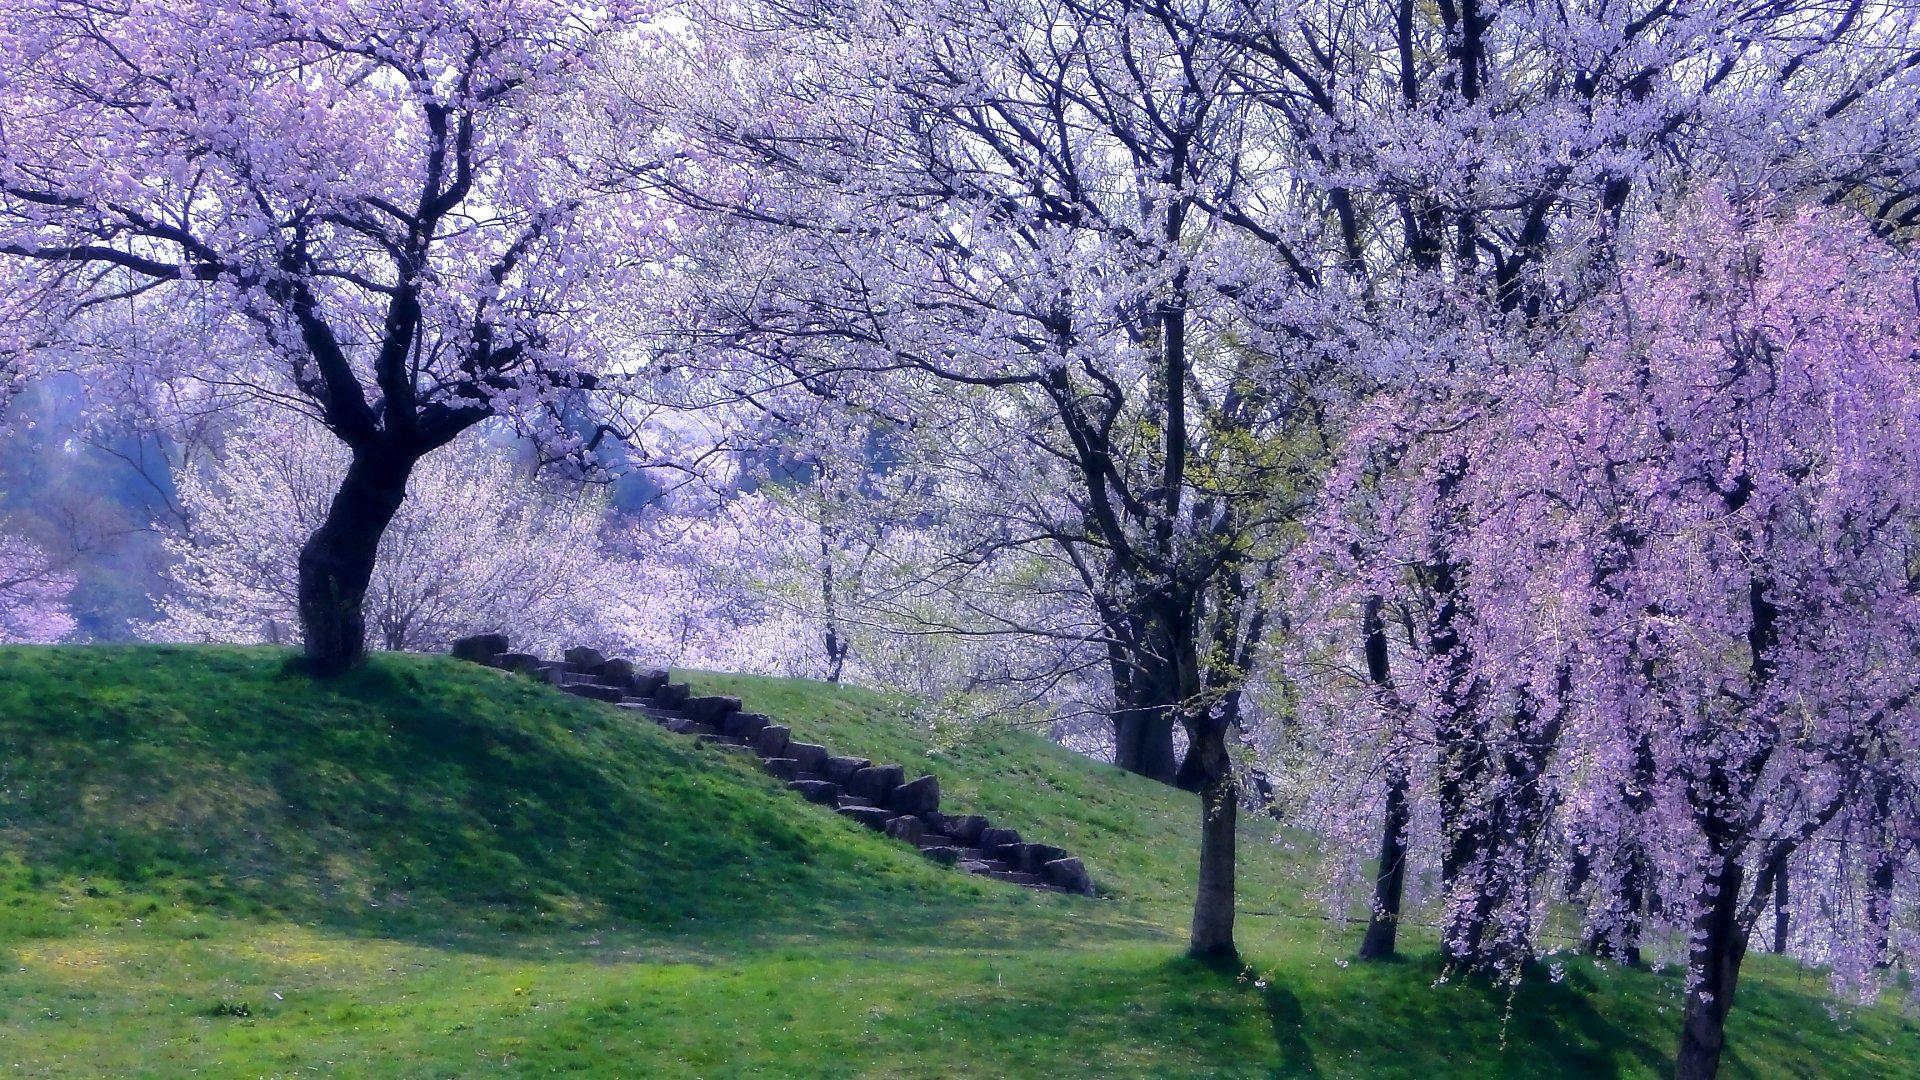 Spring wallpapers 1920x1080 Full HD (1080p) desktop ...